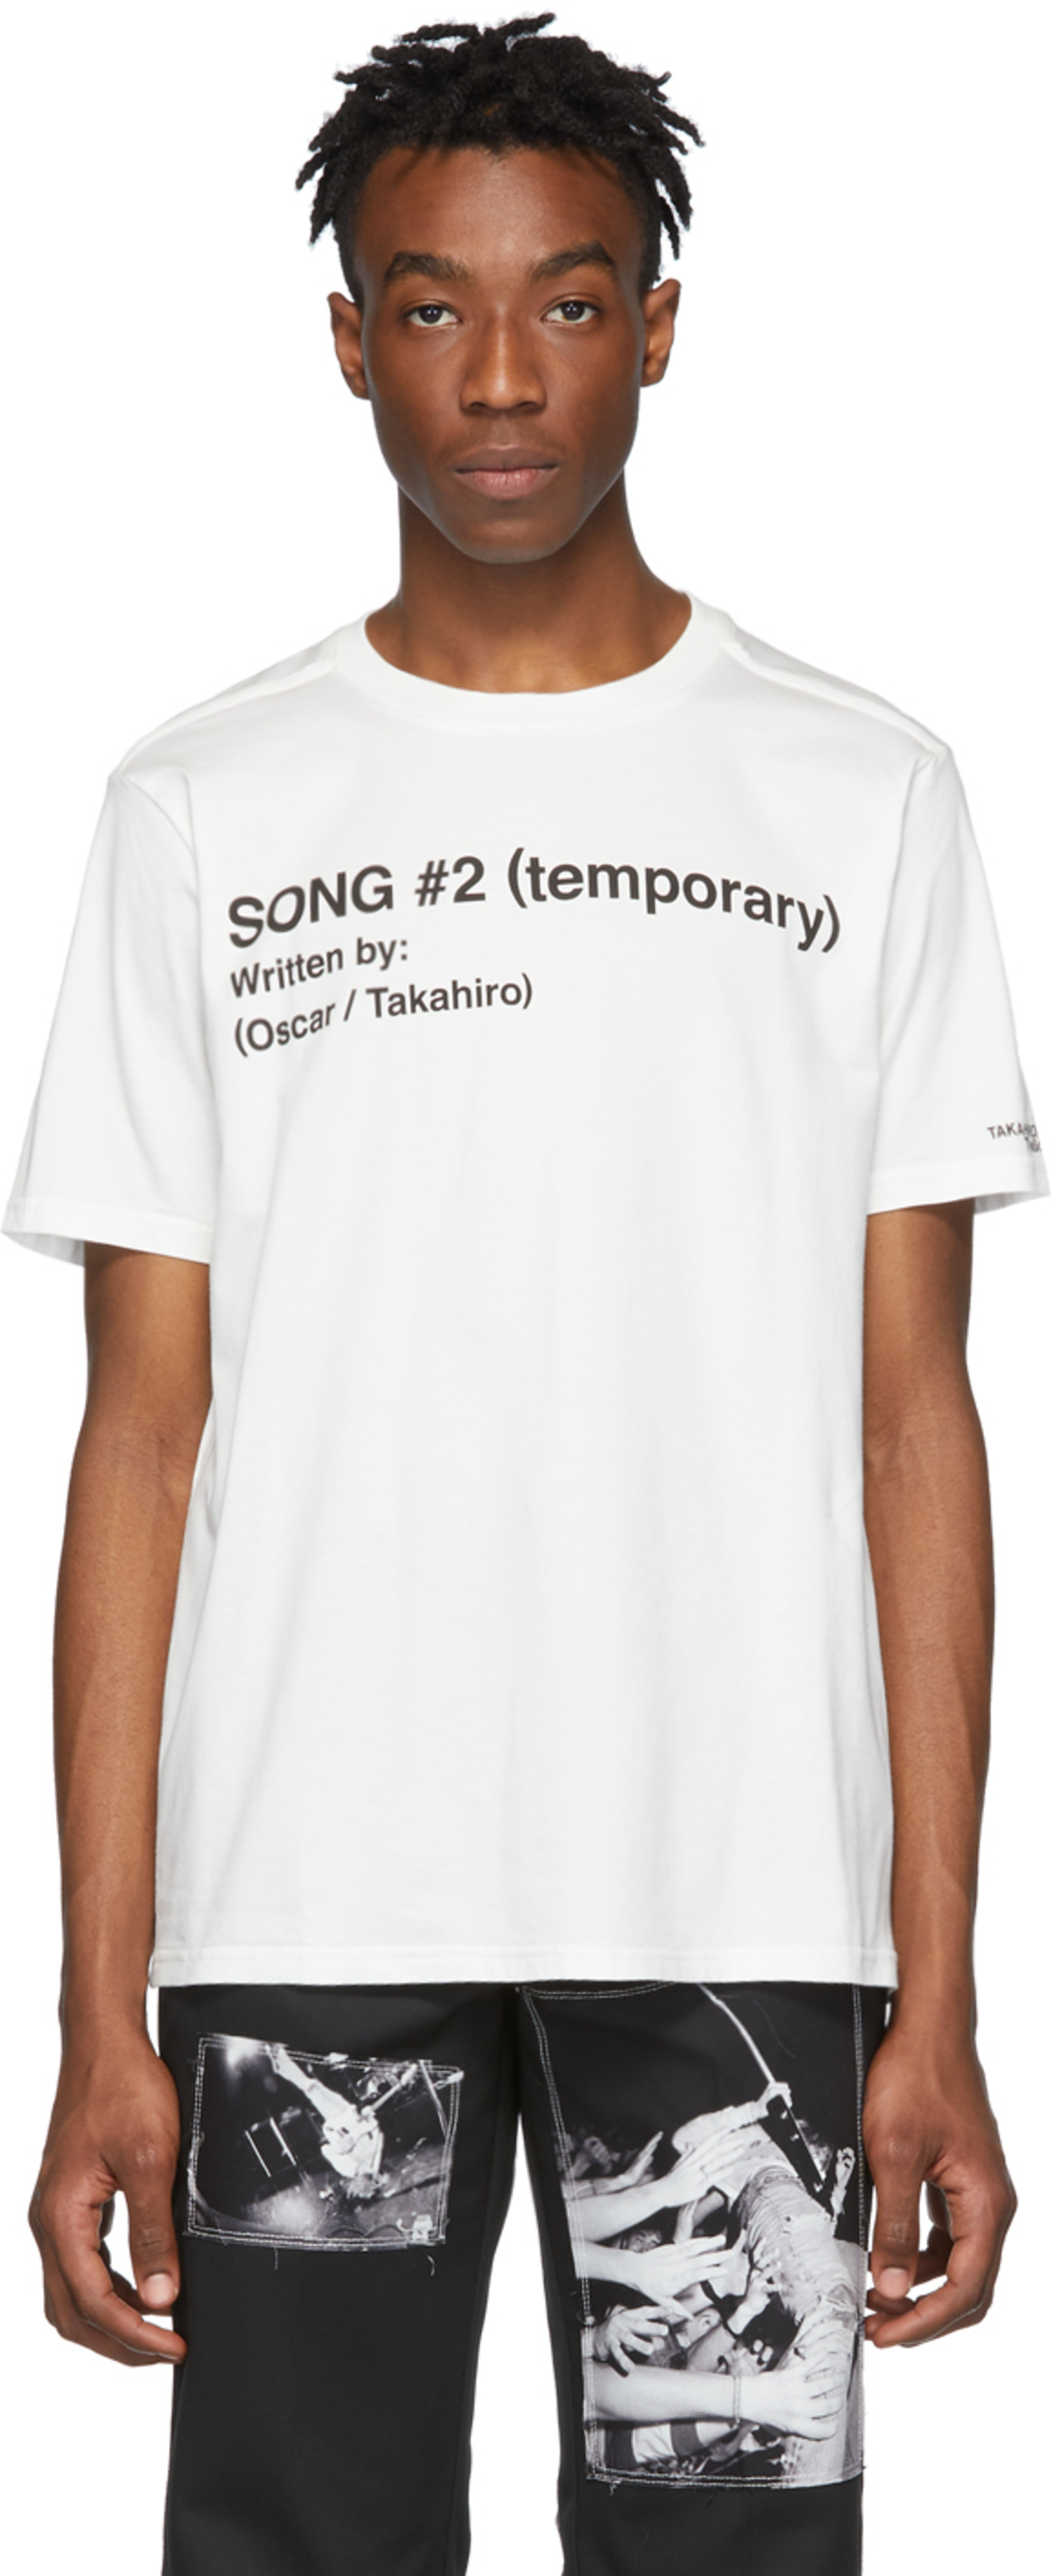 f2ca48313a9 Adidas Brazil T Shirt Ebay - DREAMWORKS